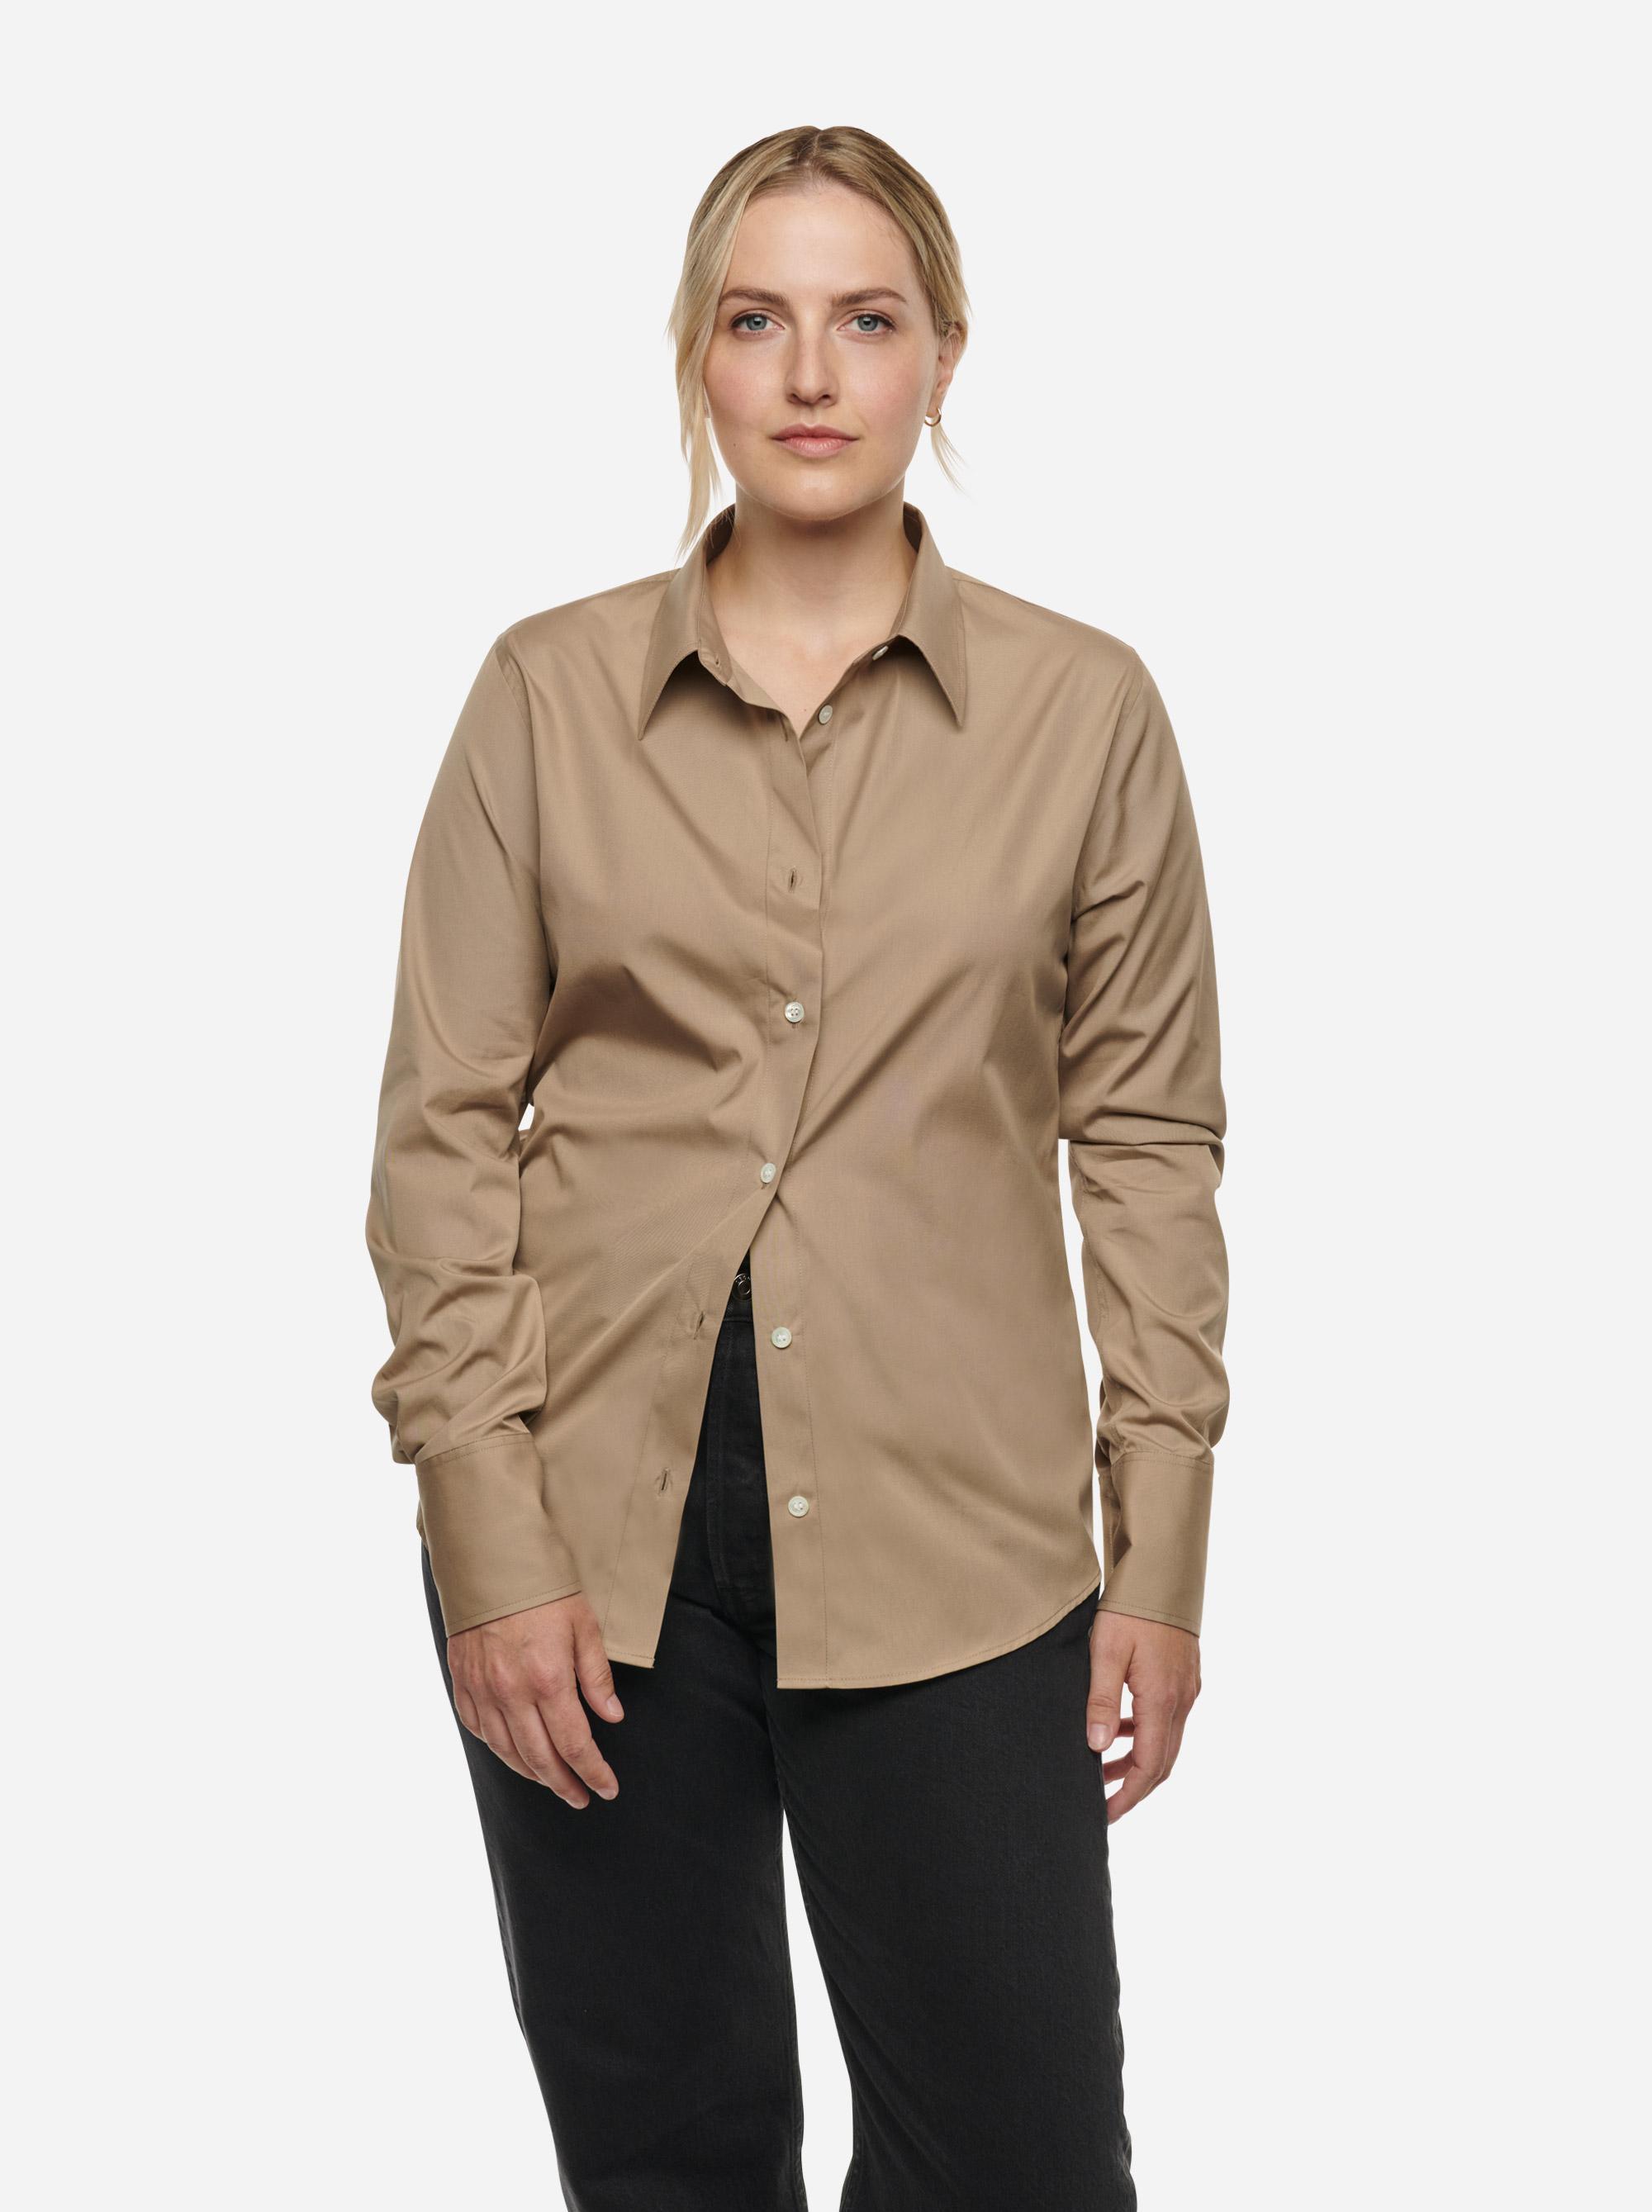 Teym-Shirt-Beige_women-3